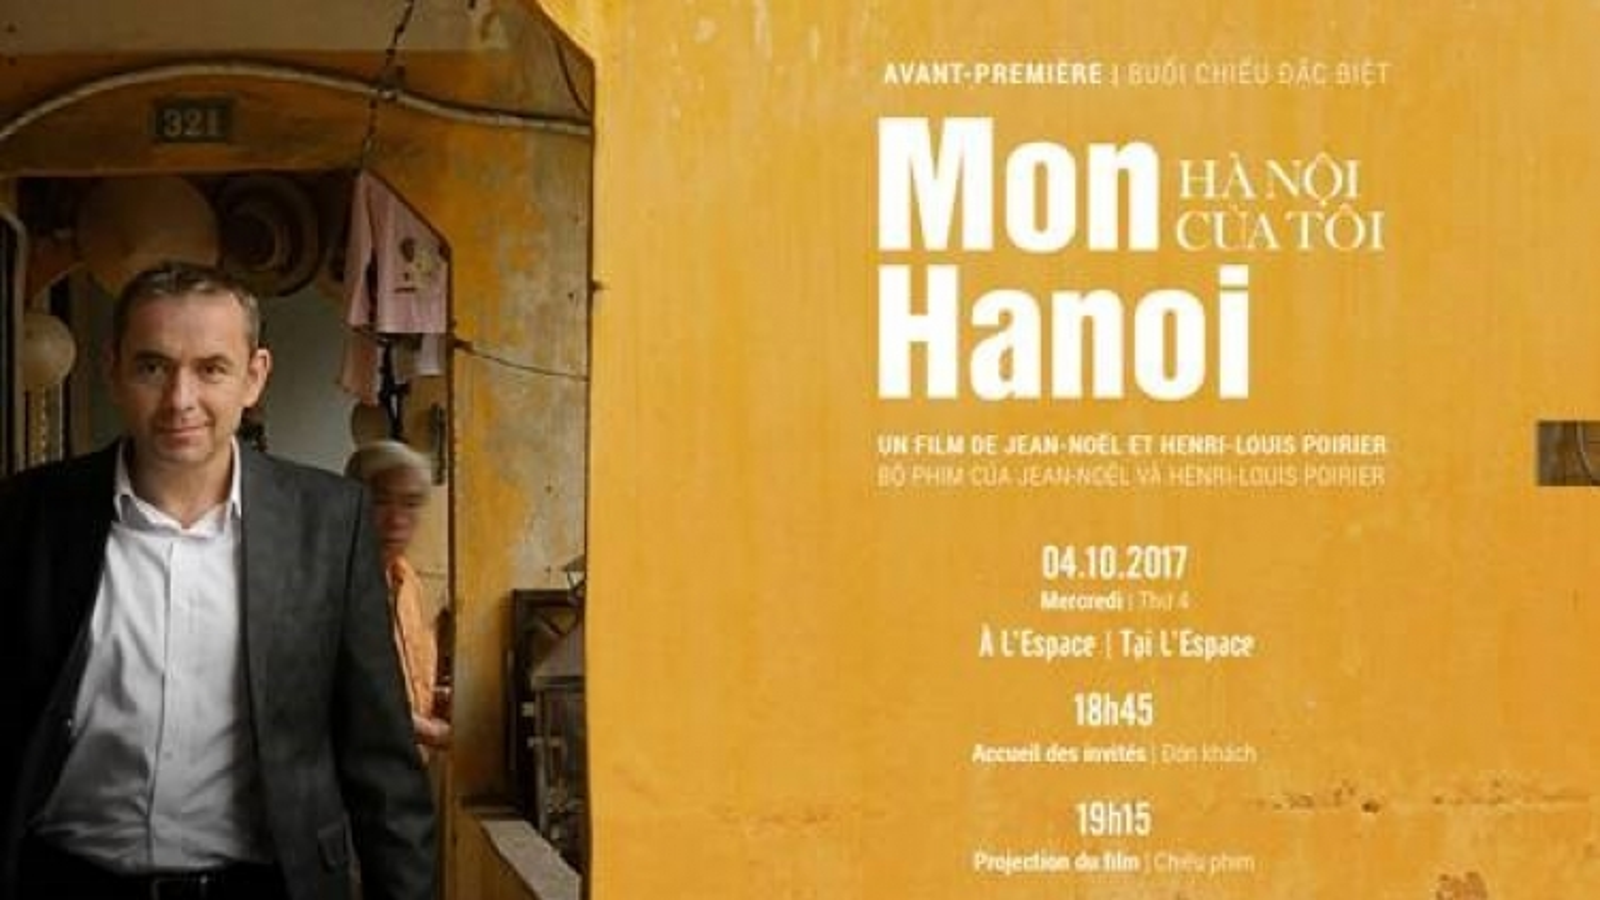 Hanoi documentary by ex-French Ambassador to be screened